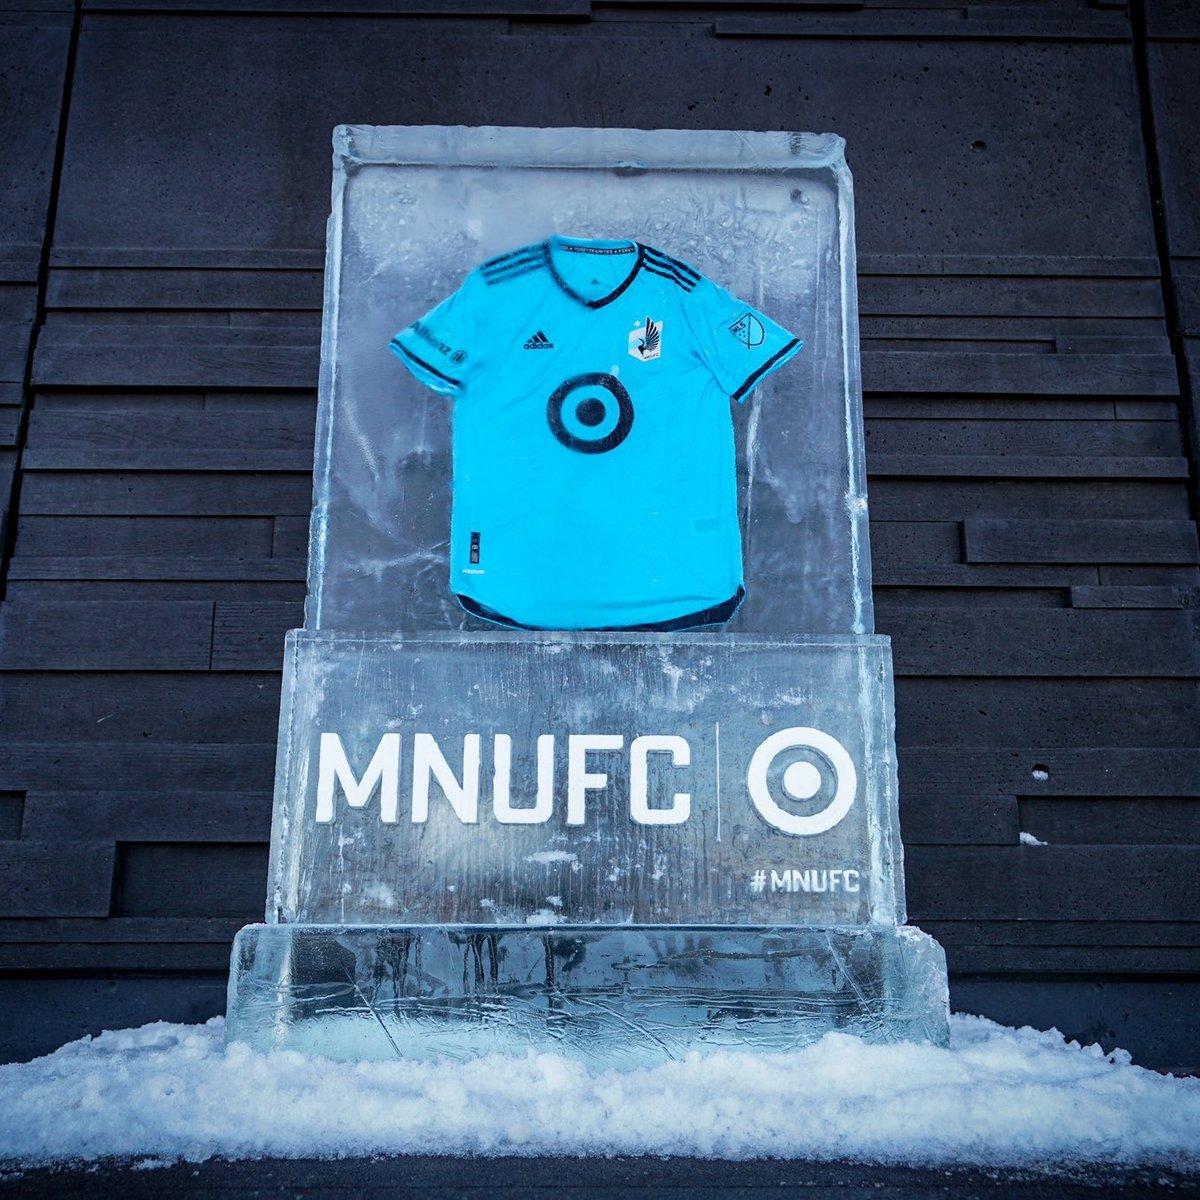 Frozen (2013) 📸: @MNUFC